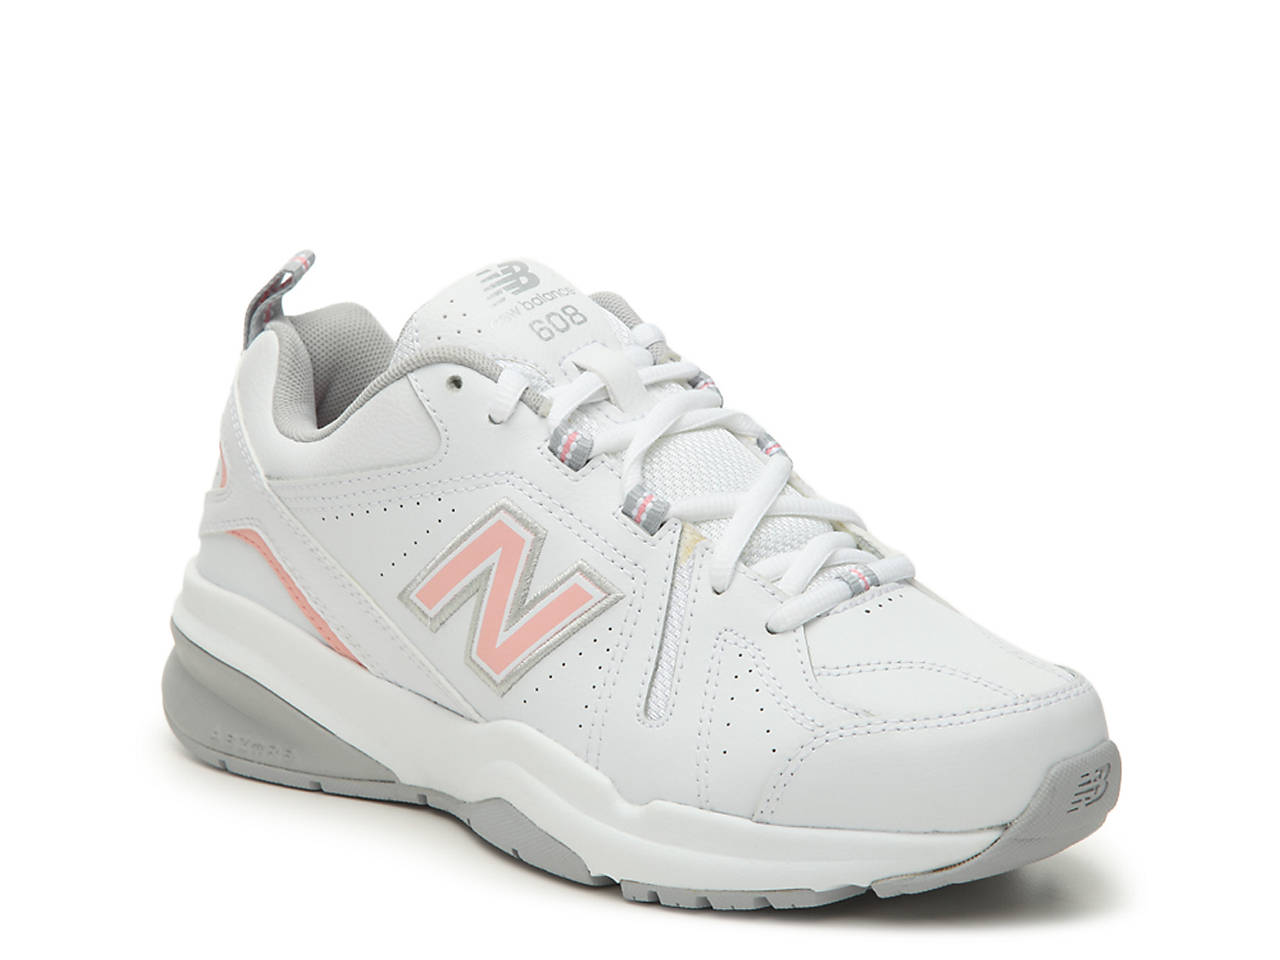 new style b6dbf 8c641 New Balance. 608 Training Shoe - Women s